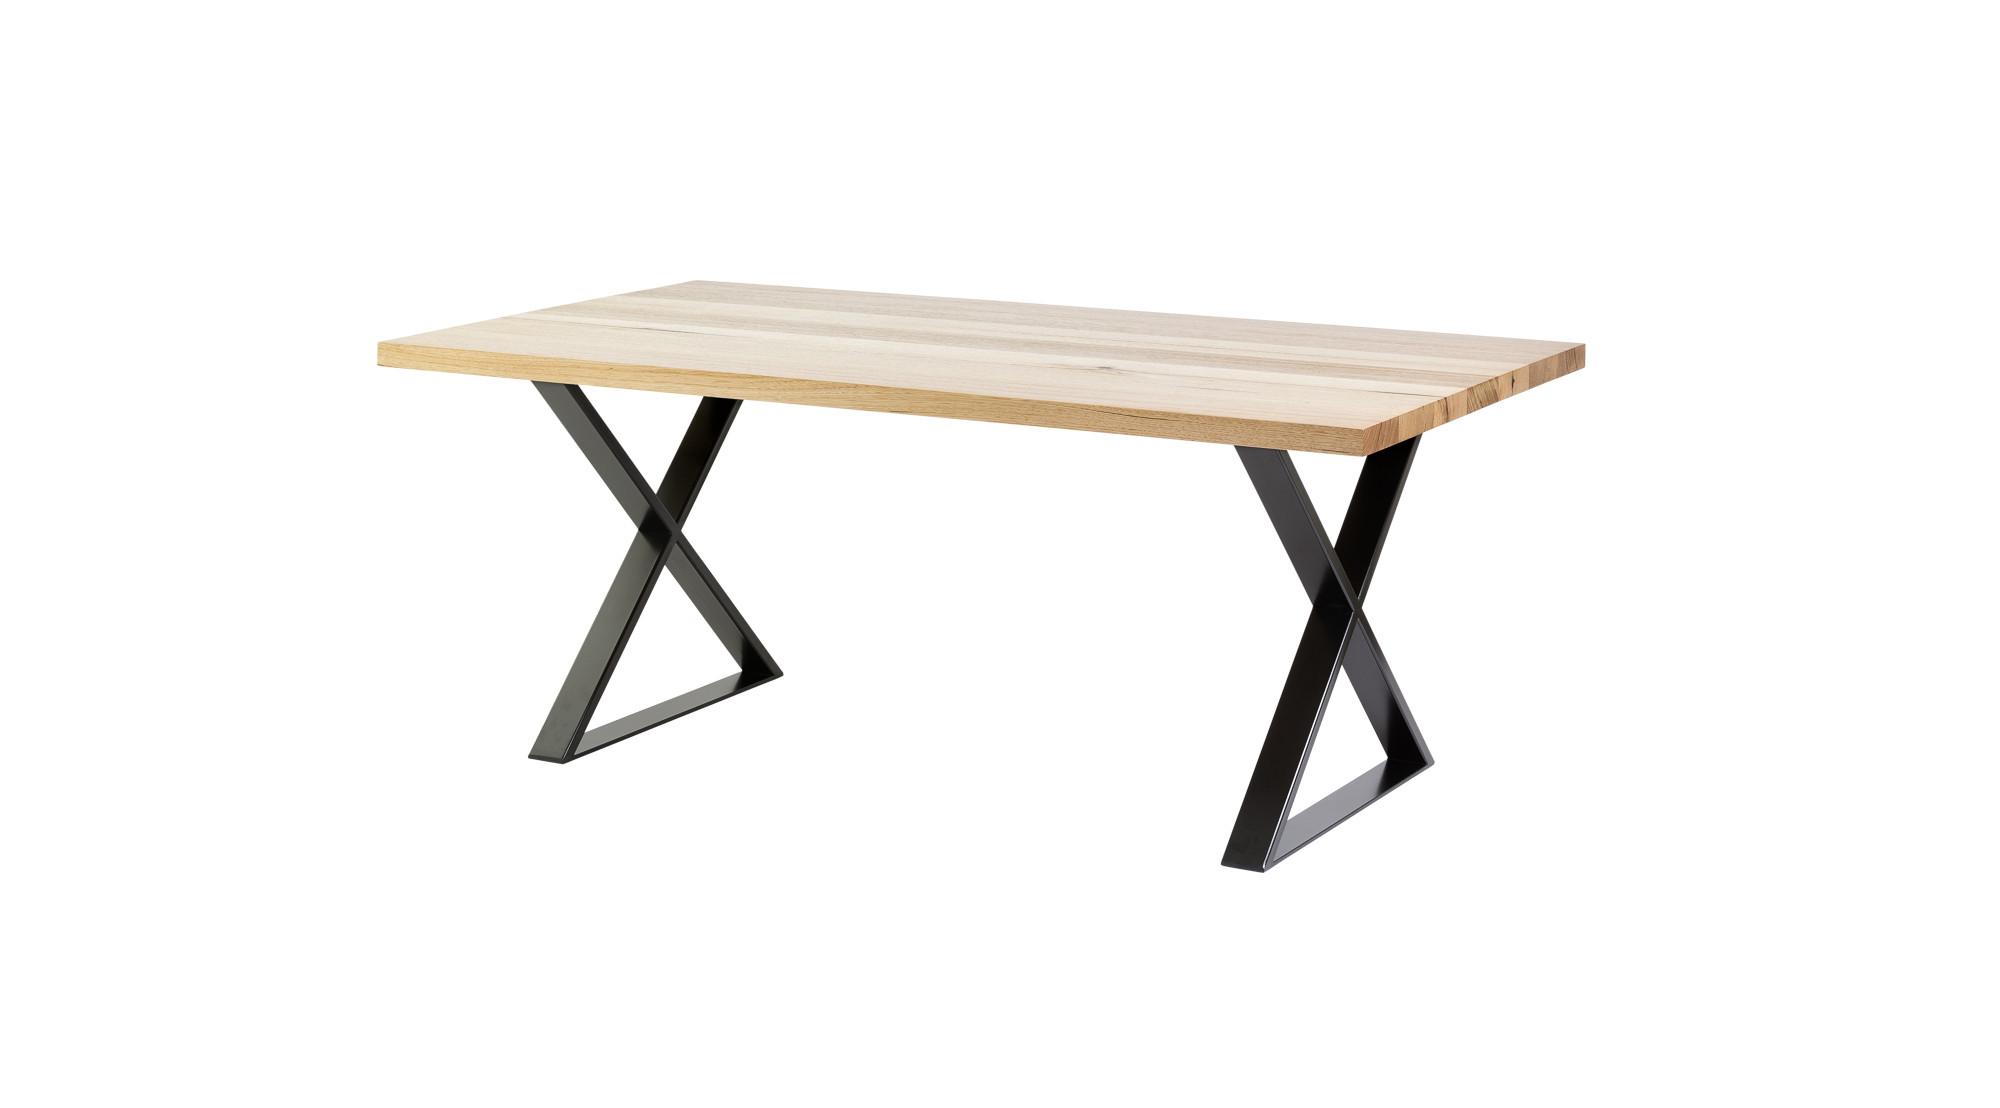 x steel table legs